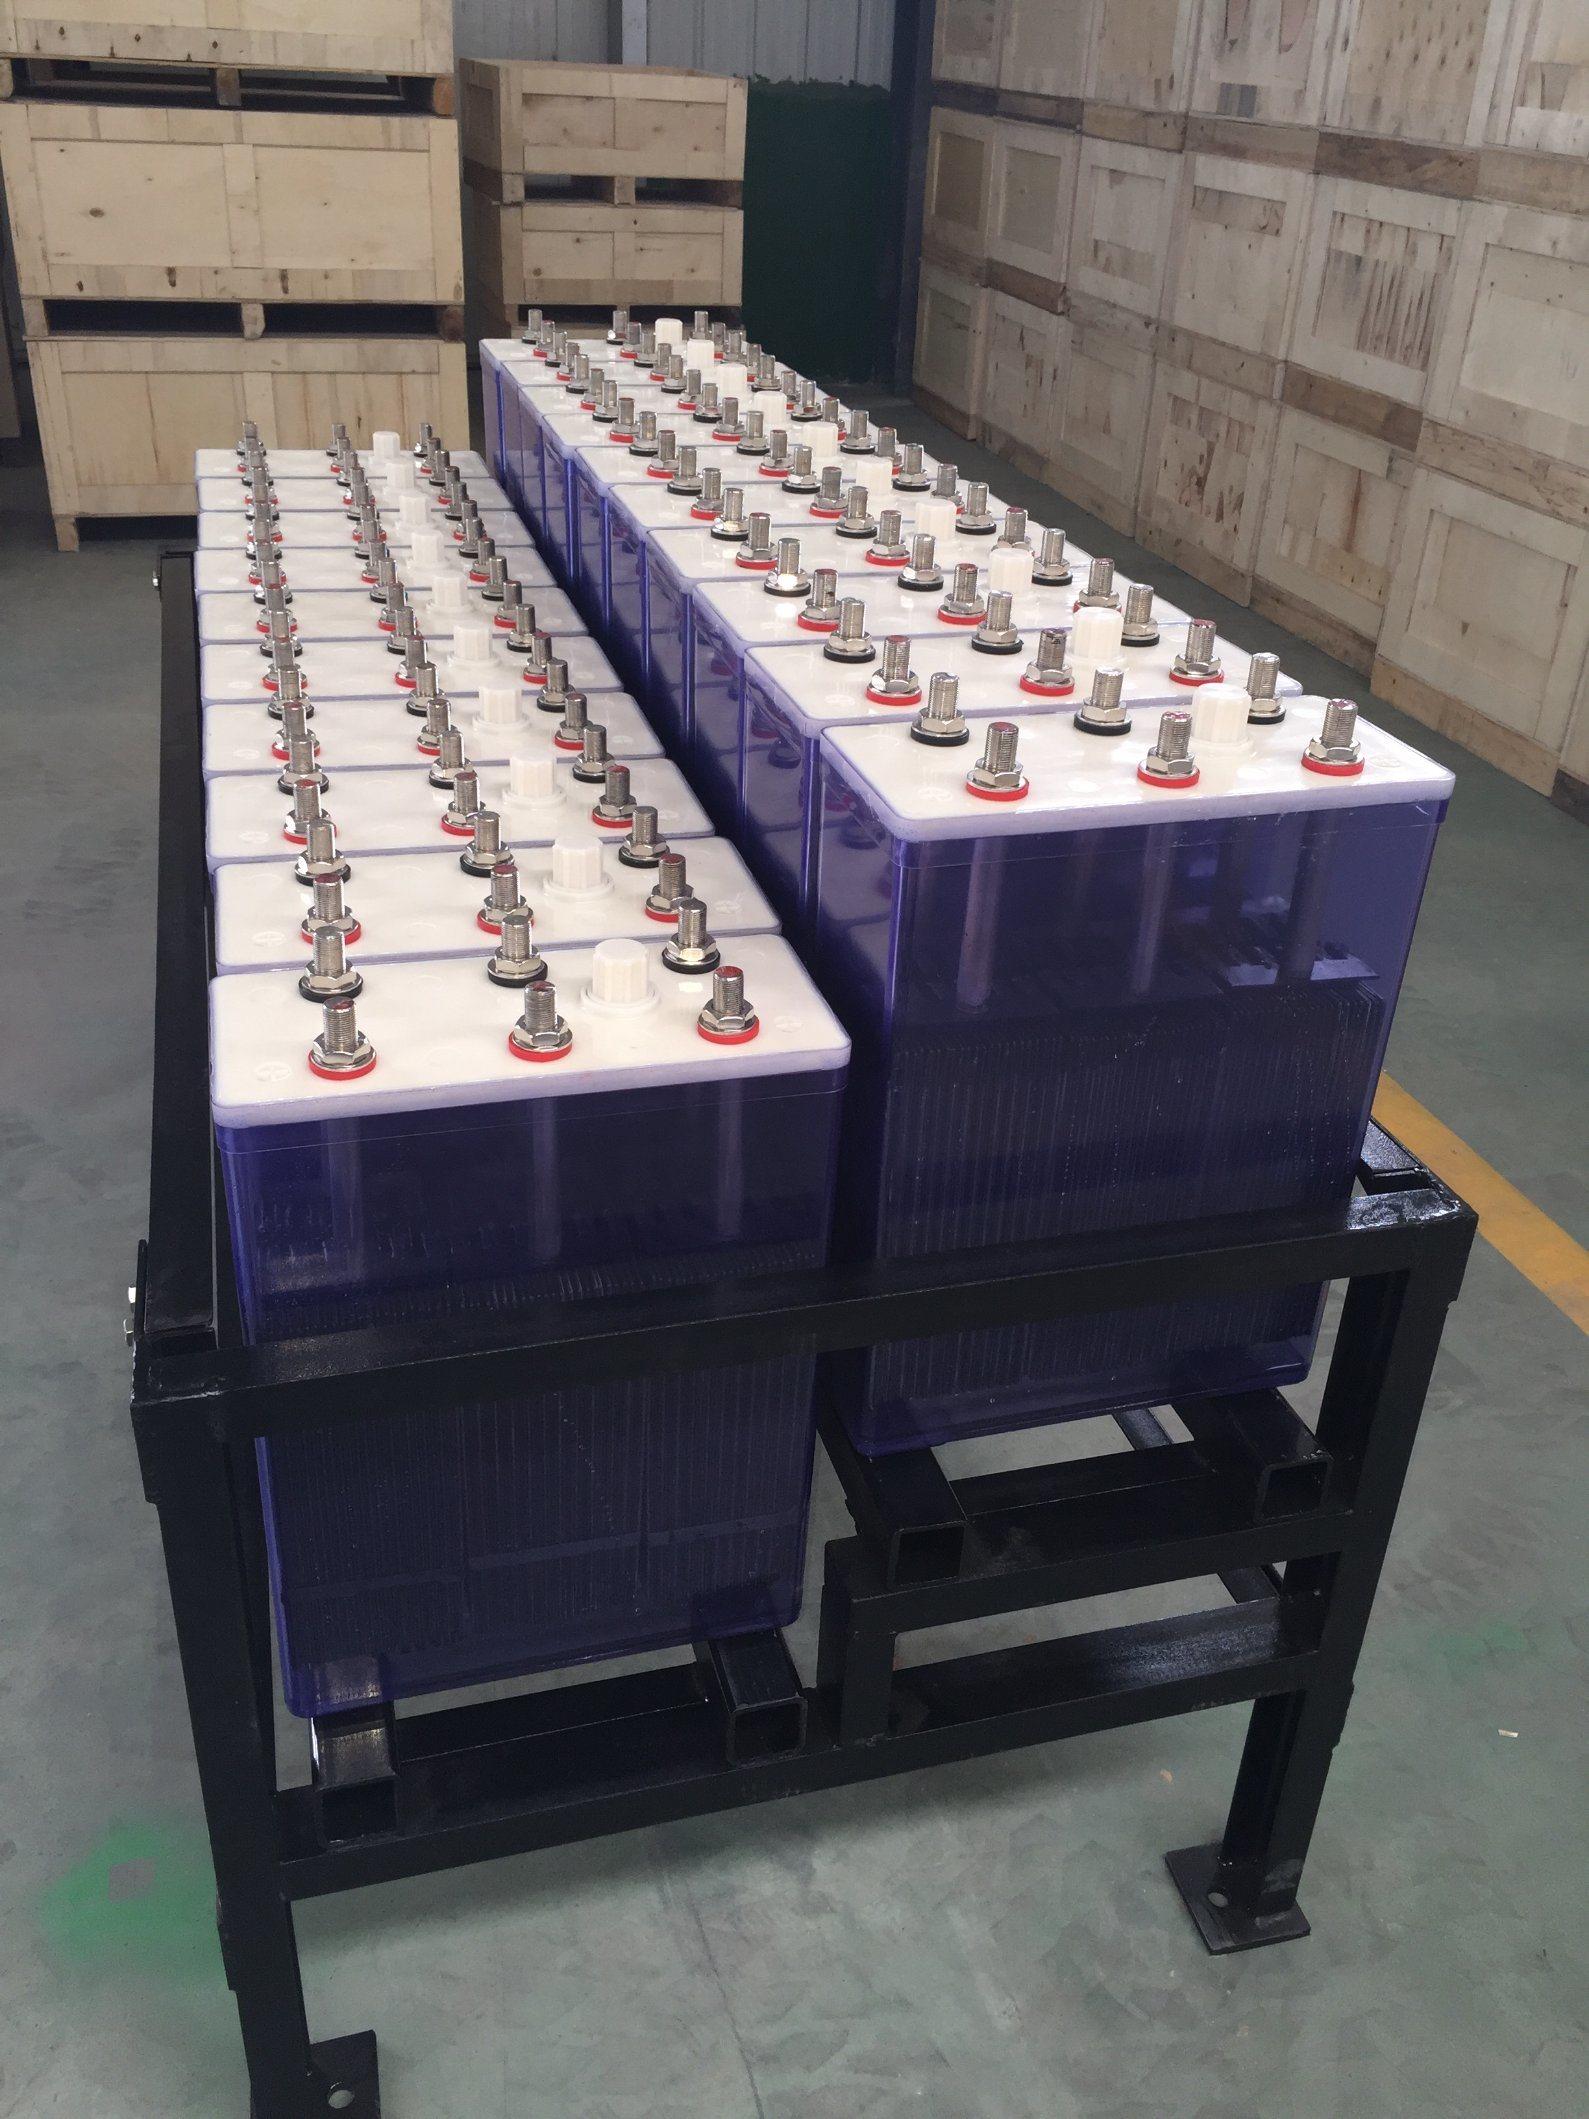 24V800ah (1.2V800AH) Max Life Batteries Ni-Fe Battery/Long Life Battery/Solar Nickel Iron Battery/Iron-Nickel Battery 12V 24V 48V 110V 125V 220V 380V Battery